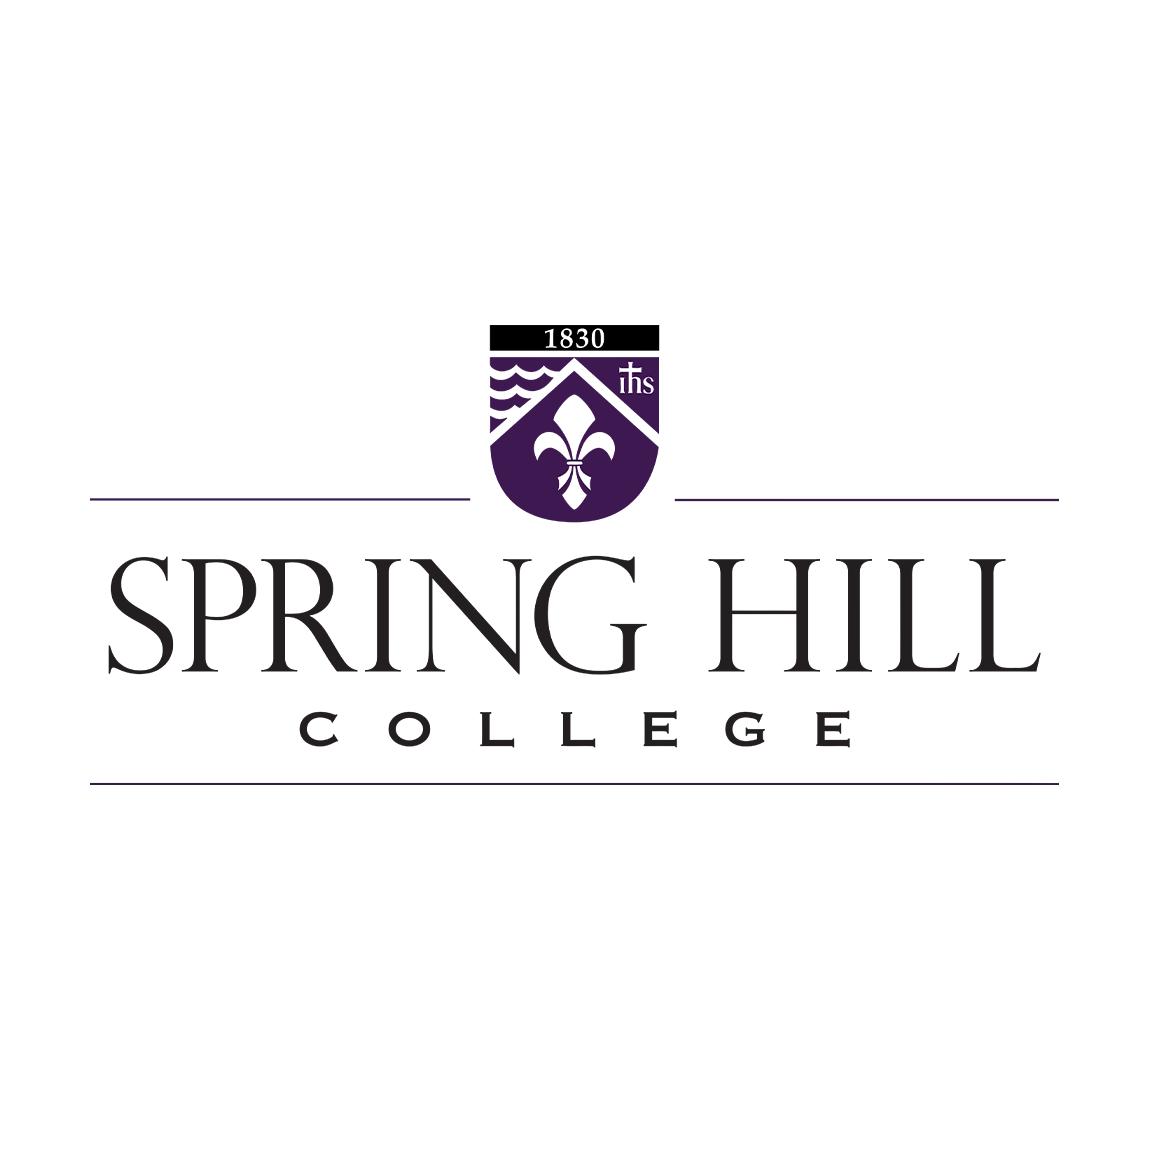 http://walterscontrols.net/wp-content/uploads/2019/12/springhill.png